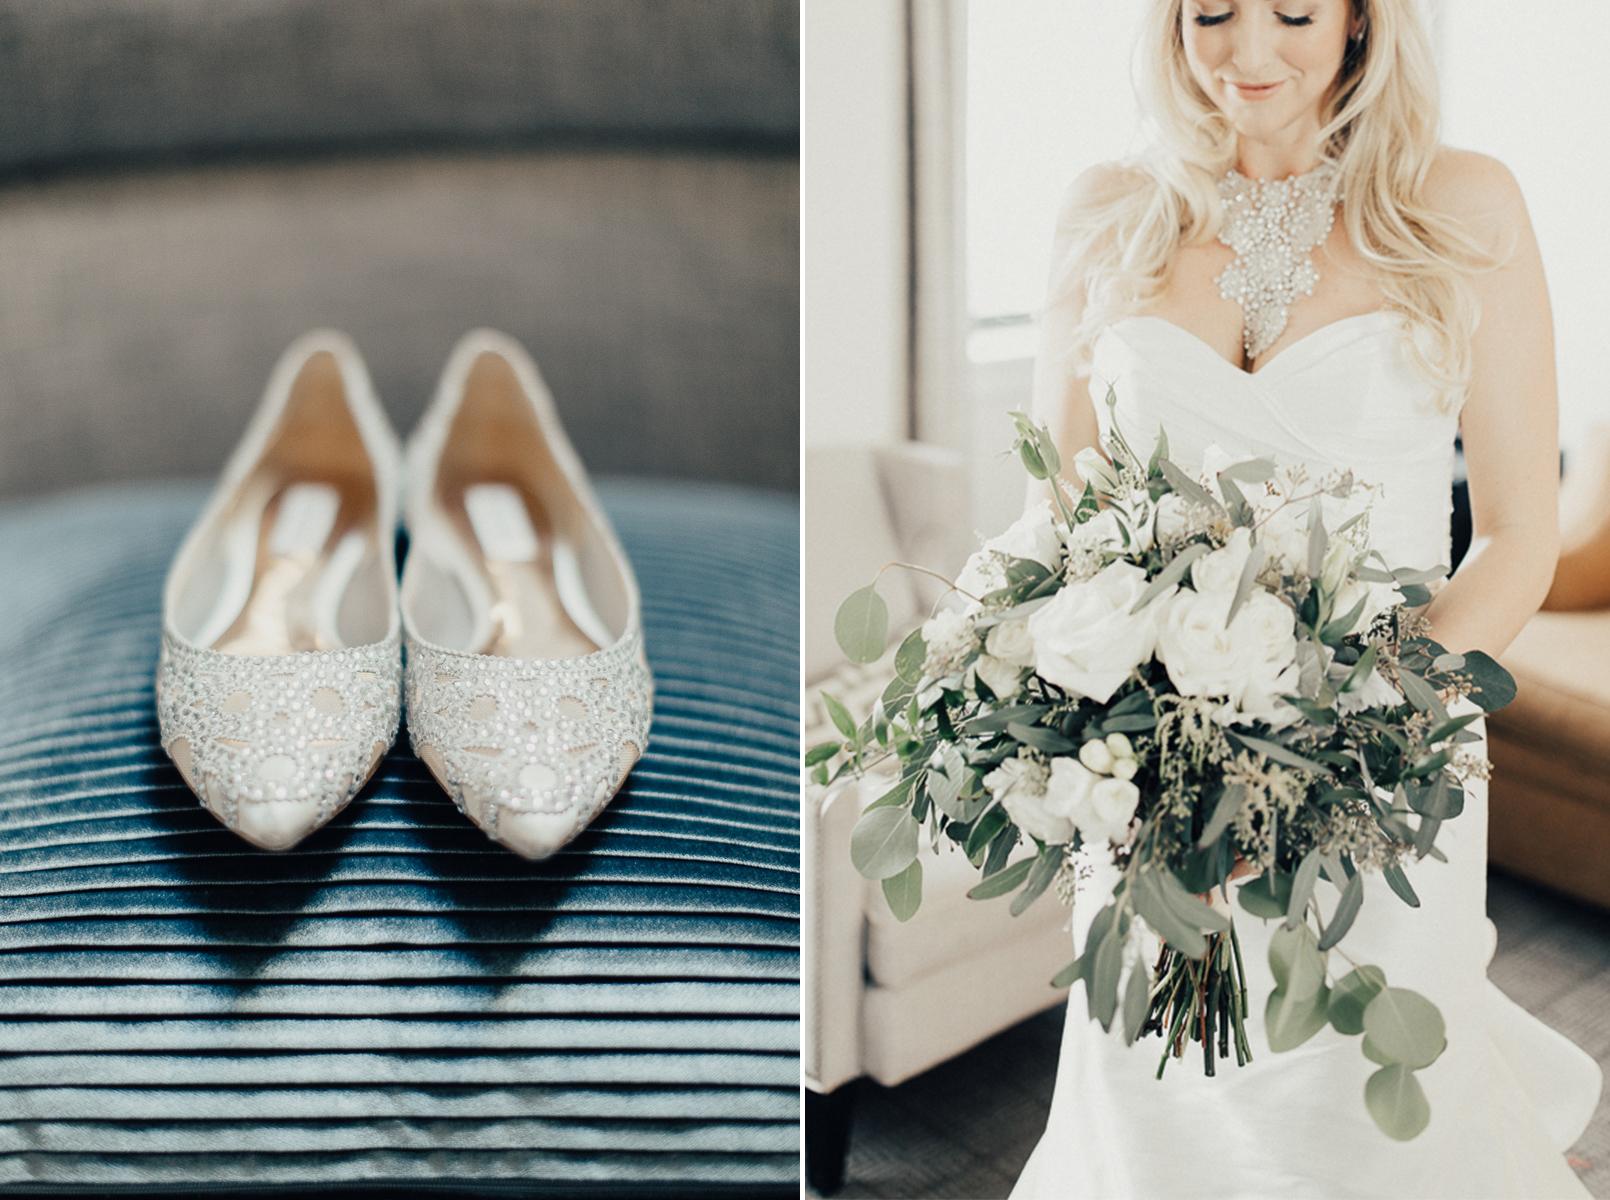 GACo_Allison-PJ-Wedding_021718-double-1.jpg